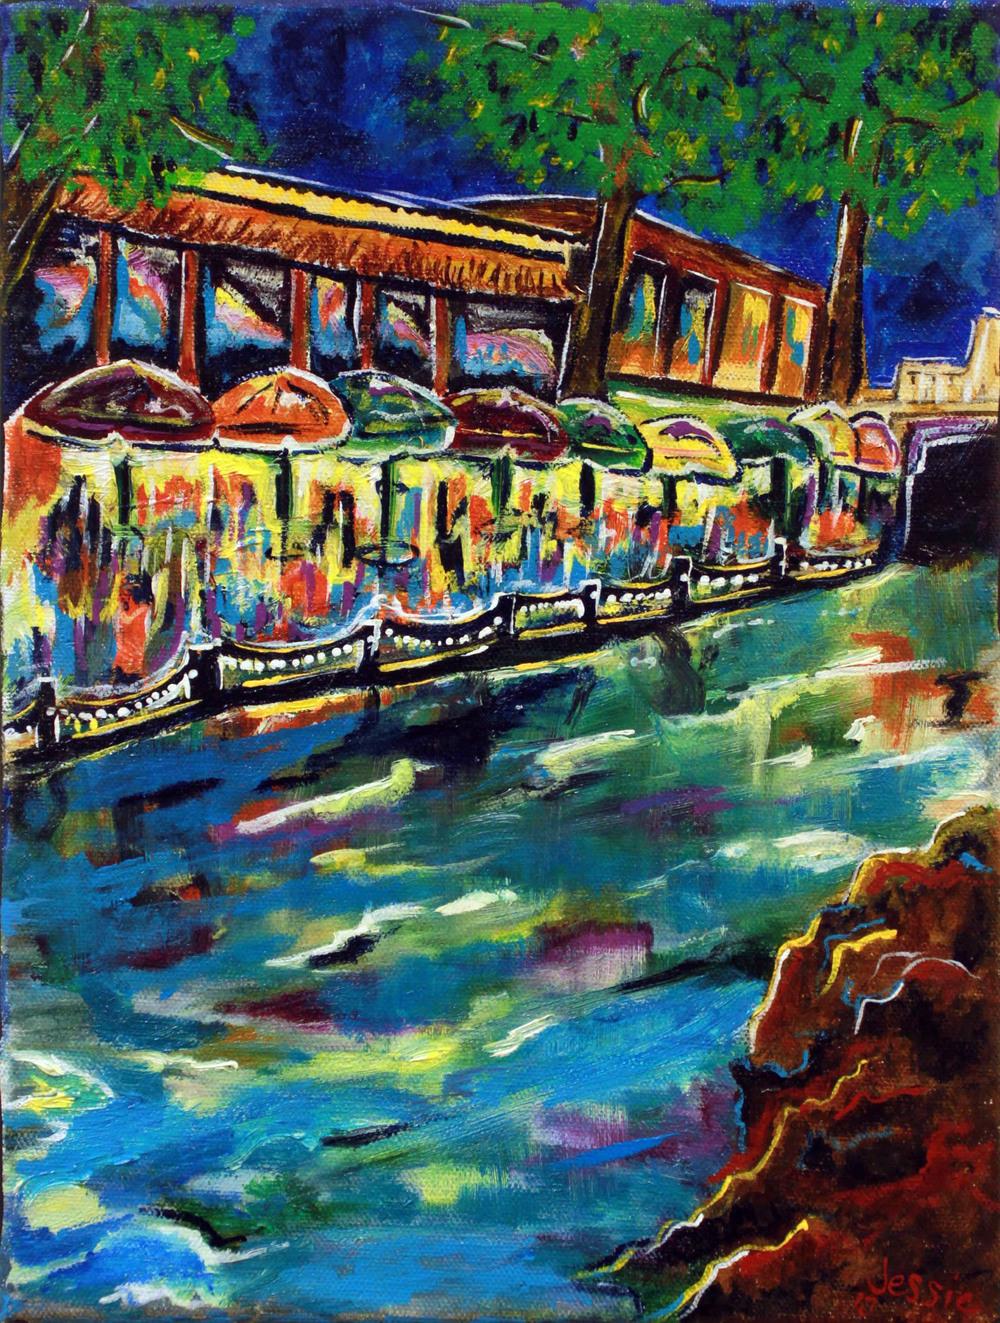 'Riverwalk'